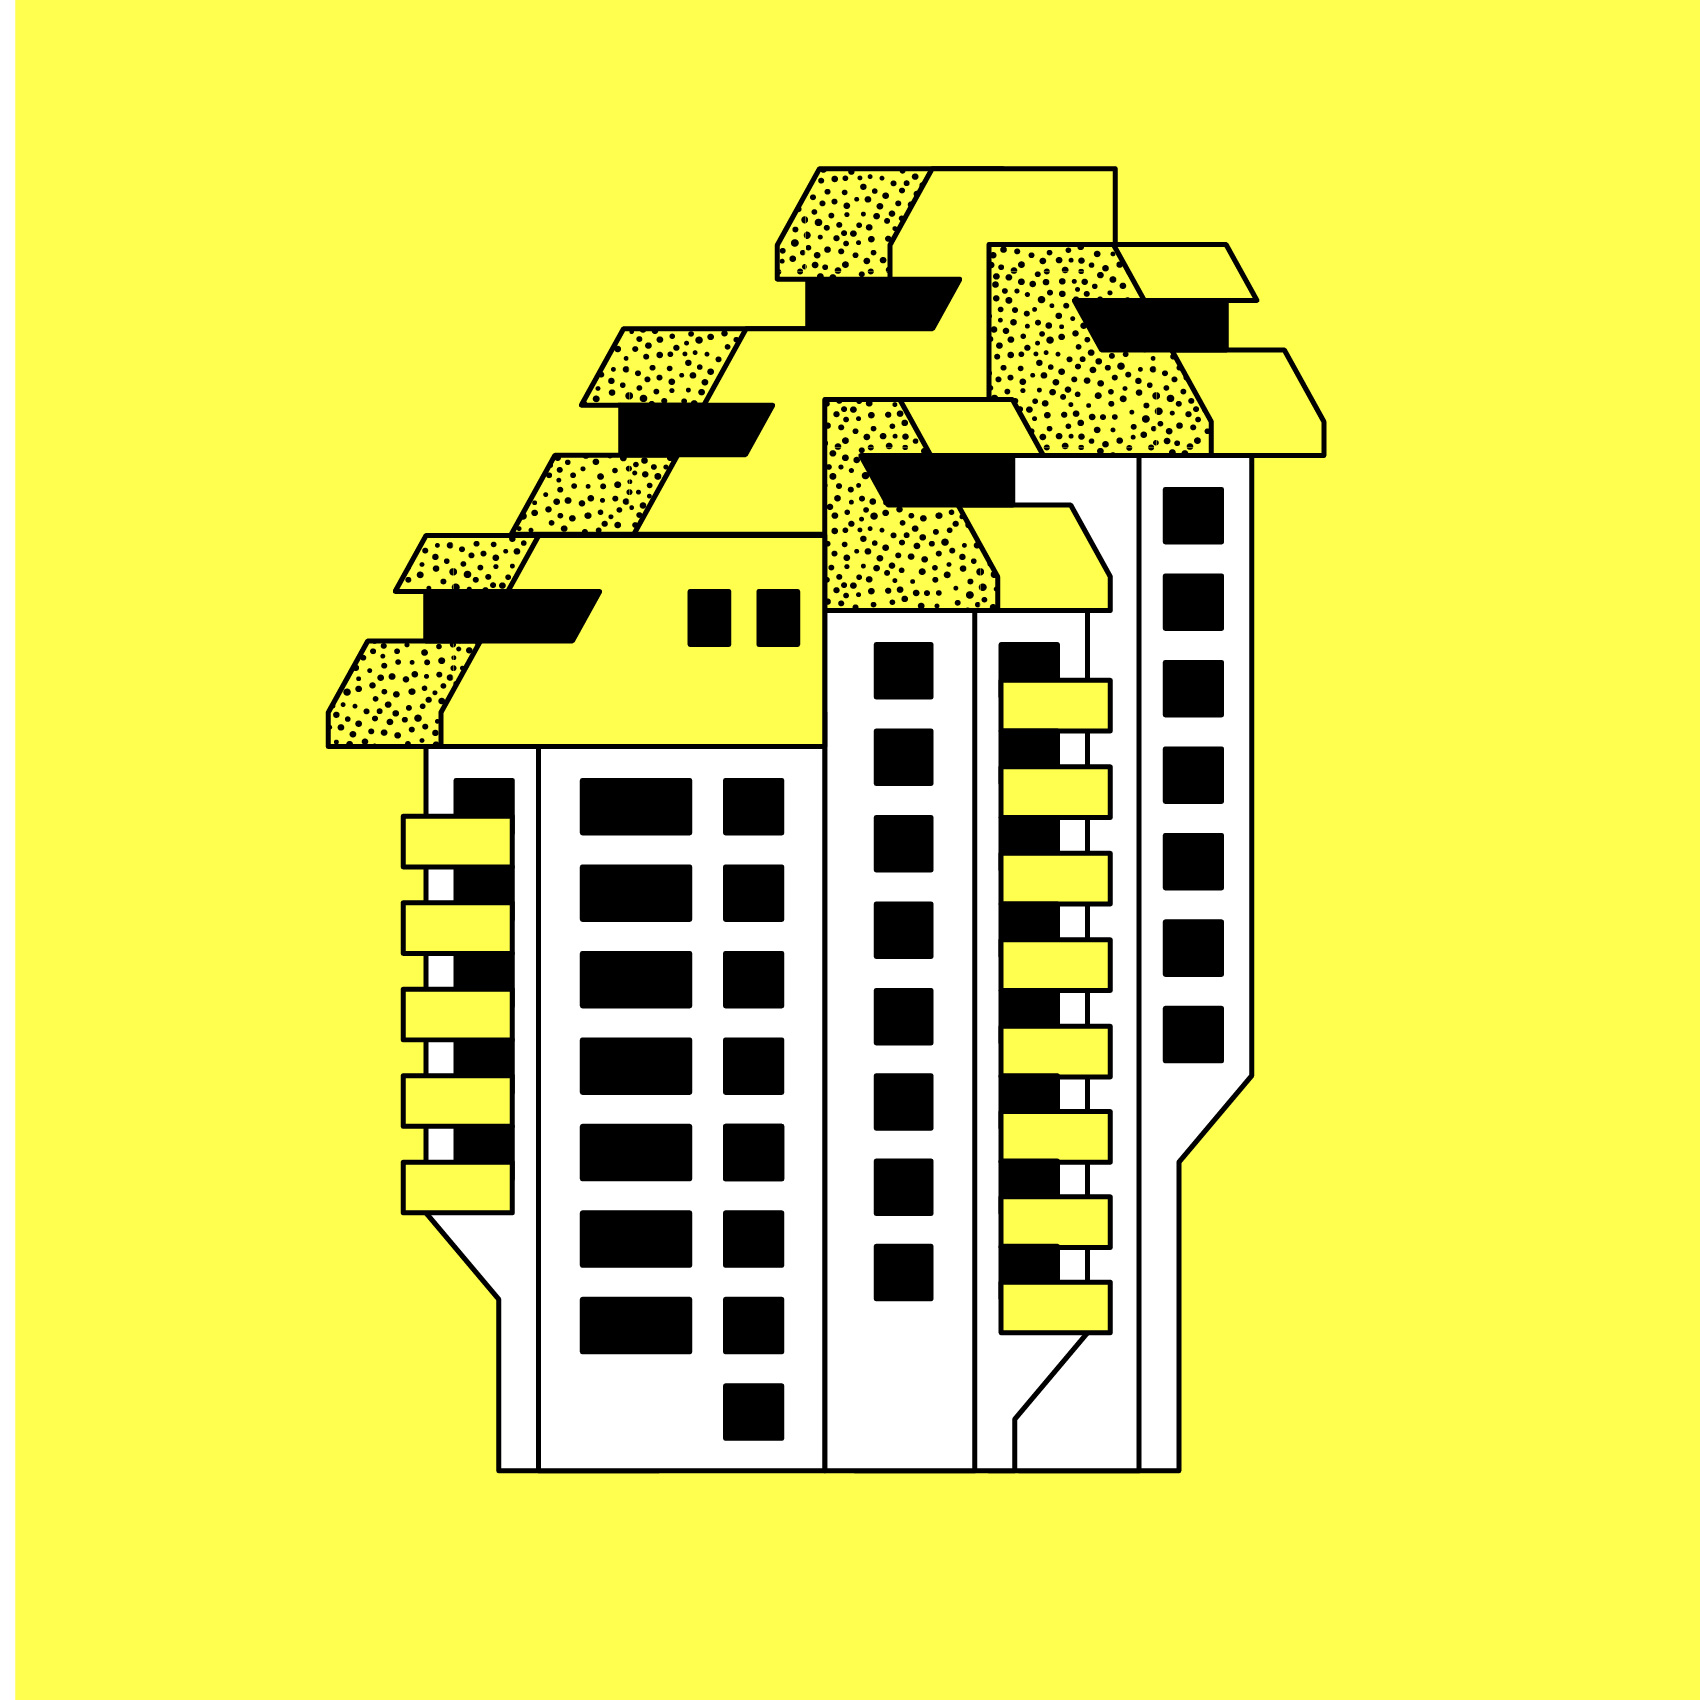 Titel: Urban structures - Residential